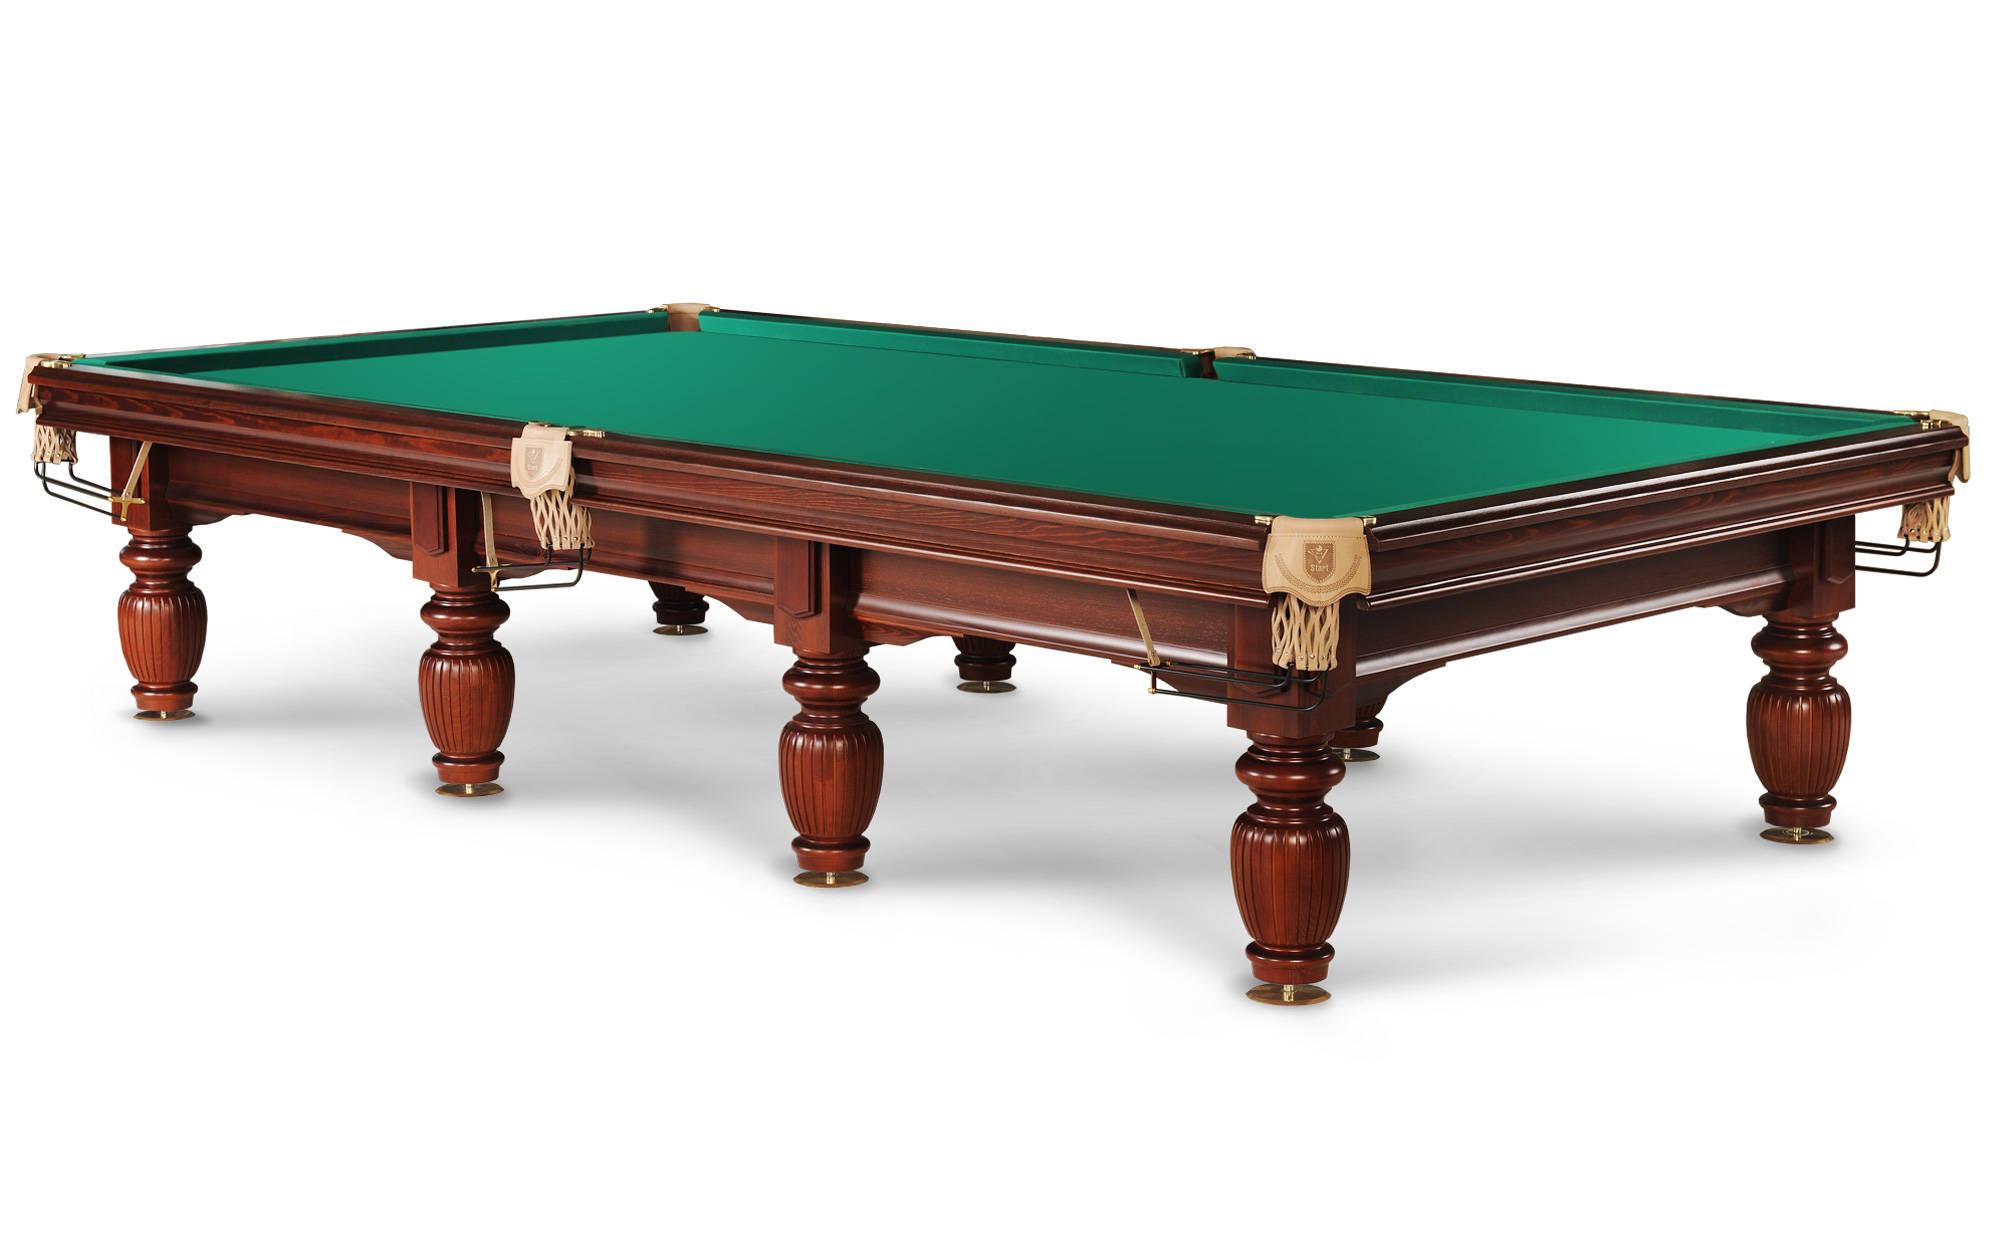 Бильярдный стол фабрика старт барон 2 9 ф главная